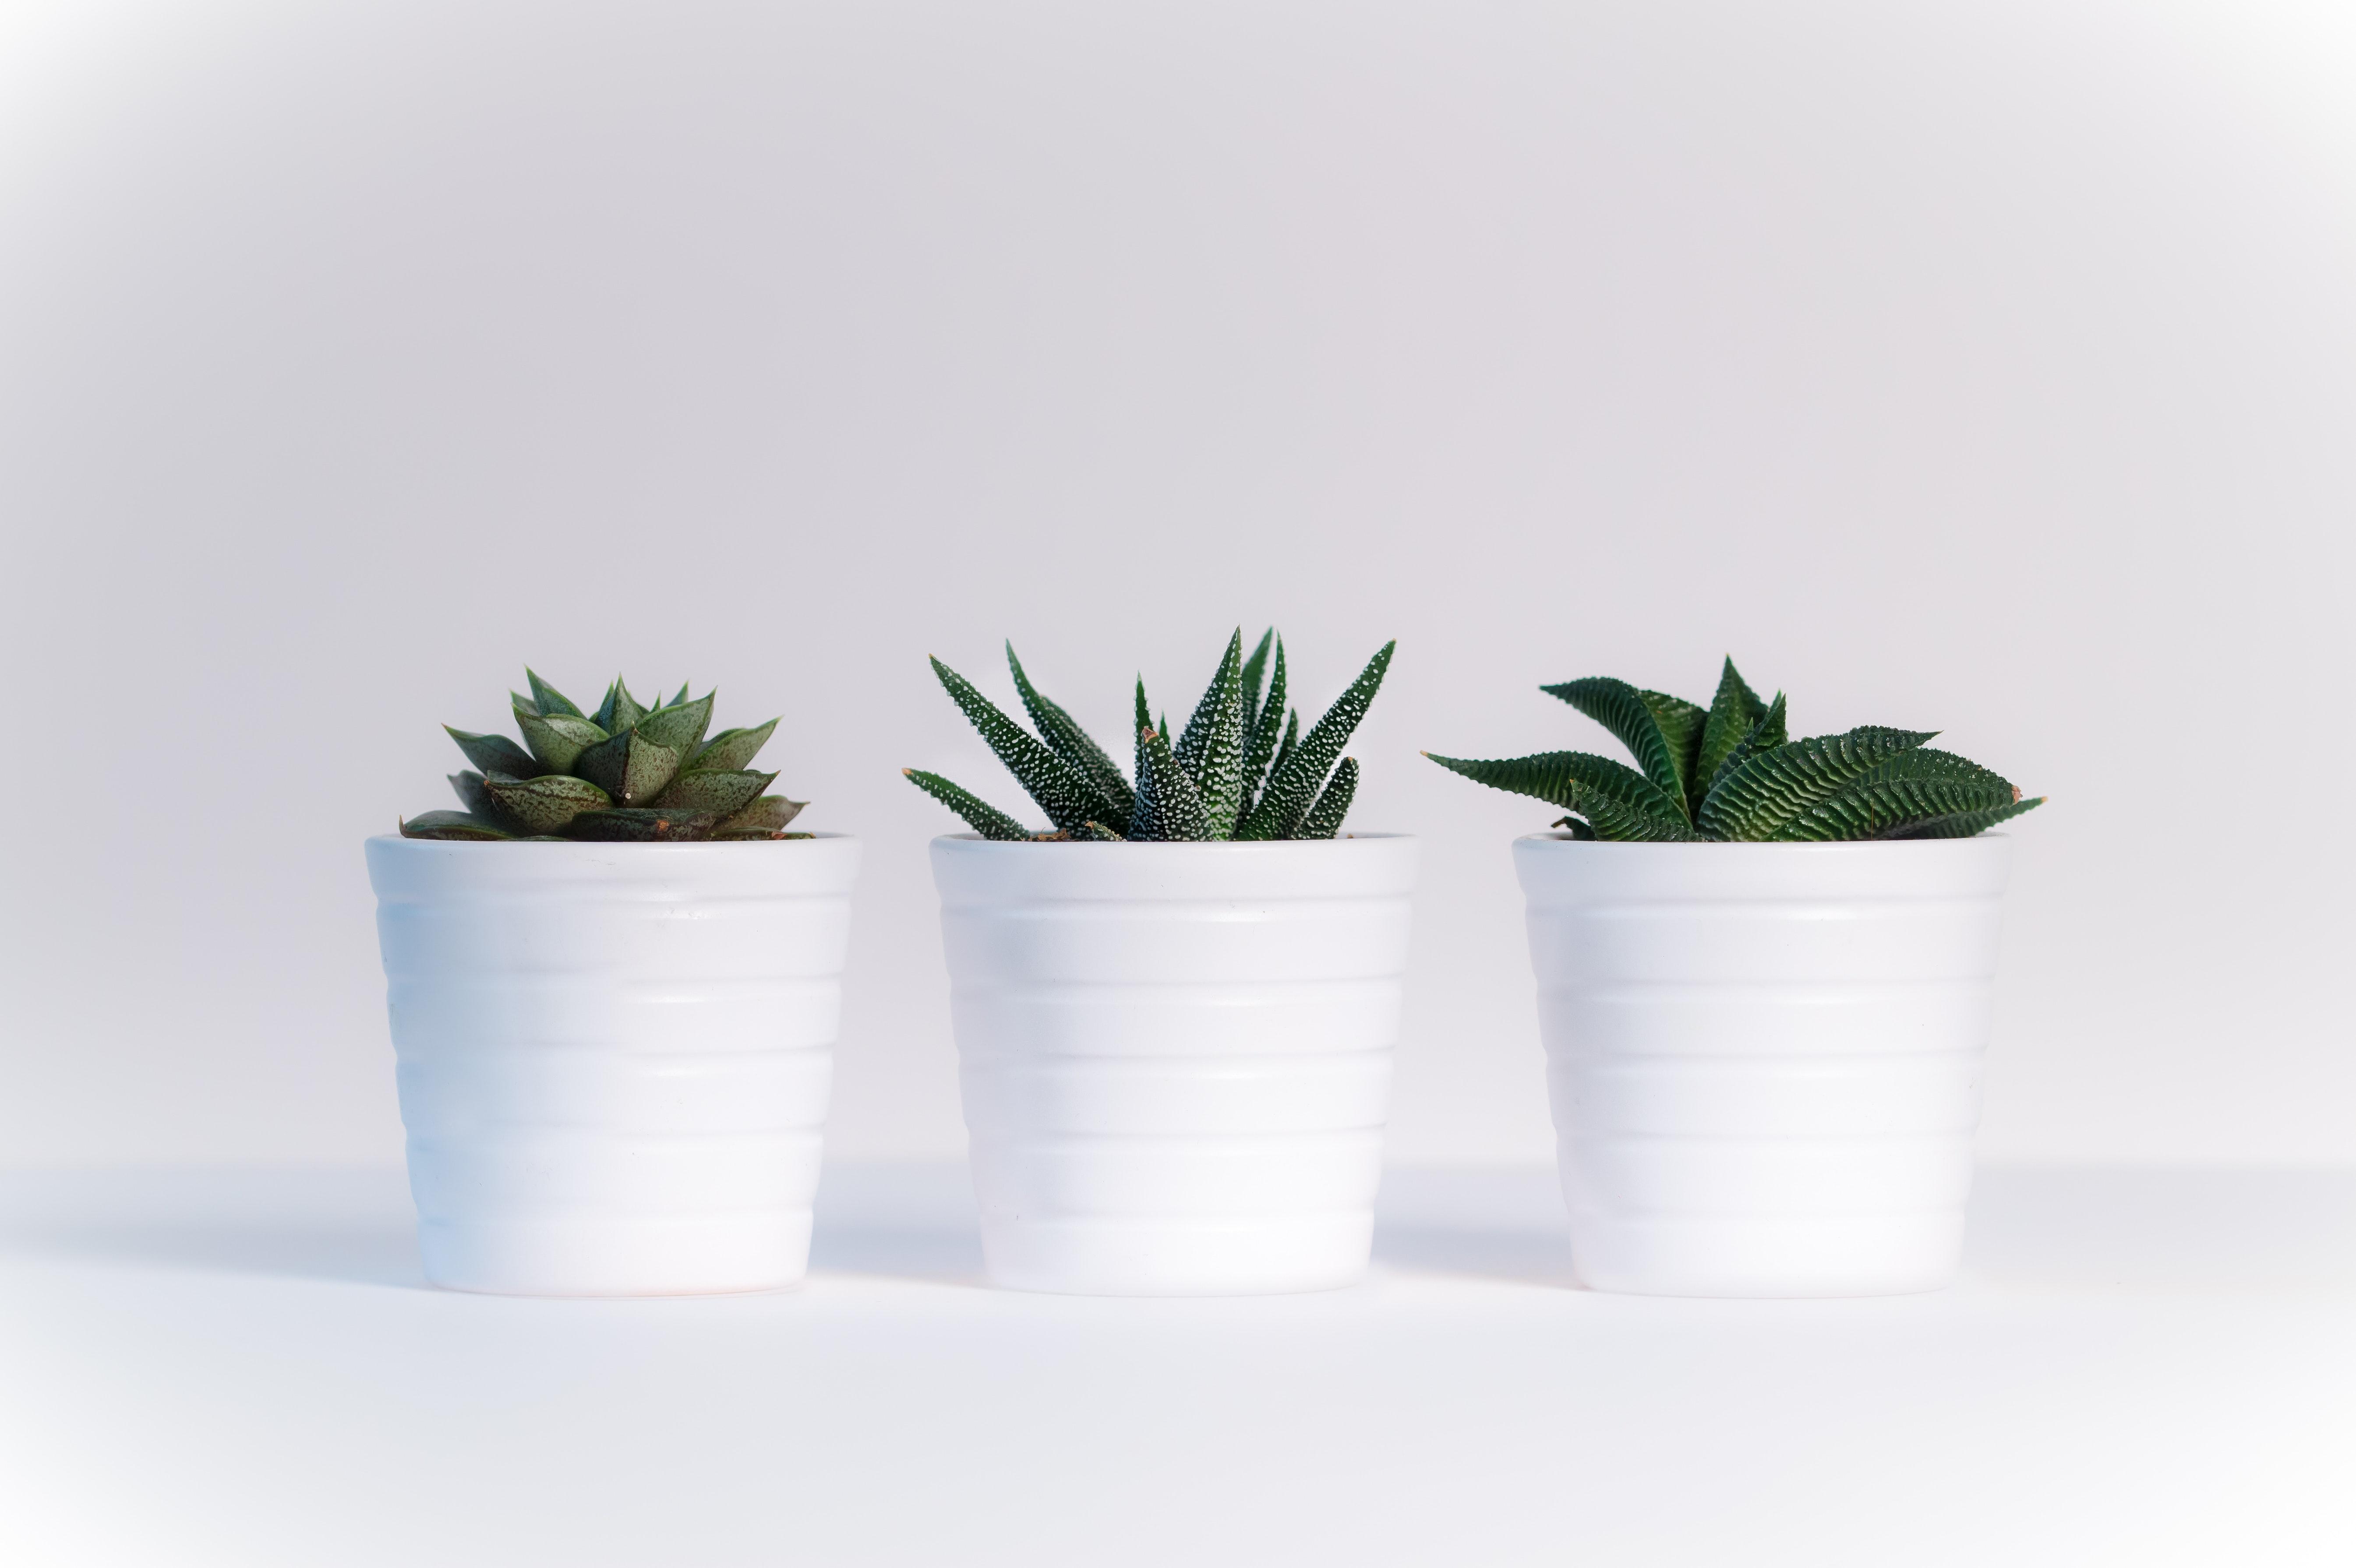 Three Green Assorted Plants in White Ceramic Pots, Plants, White background, White, Wallpaper, HQ Photo